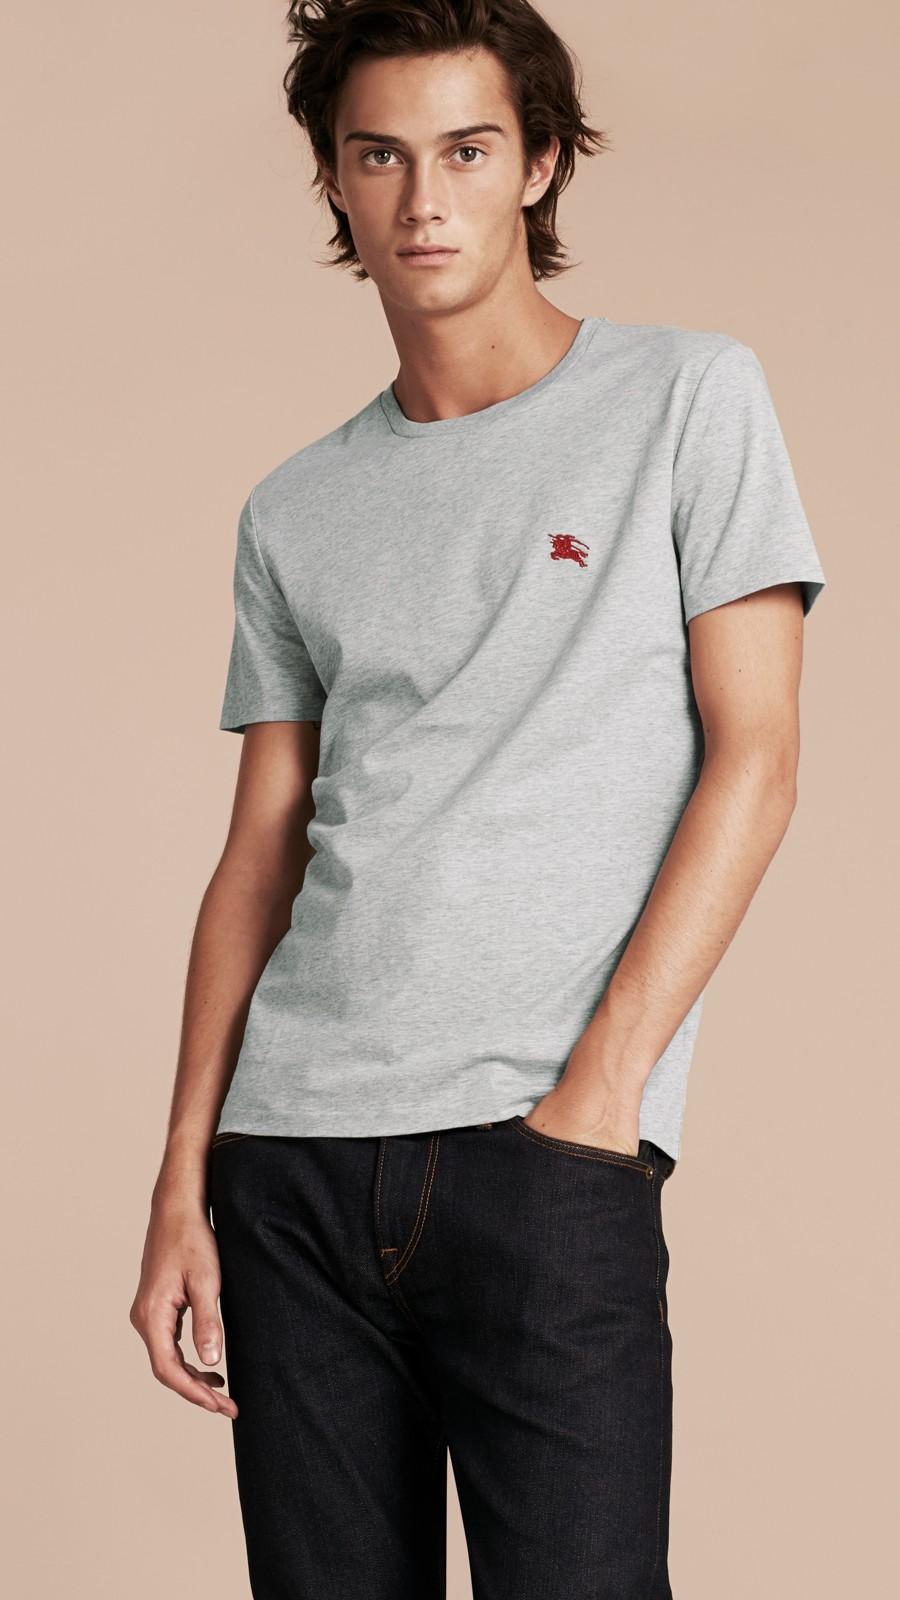 Pale grey melange Liquid-soft Cotton T-Shirt Pale Grey Melange - Image 6